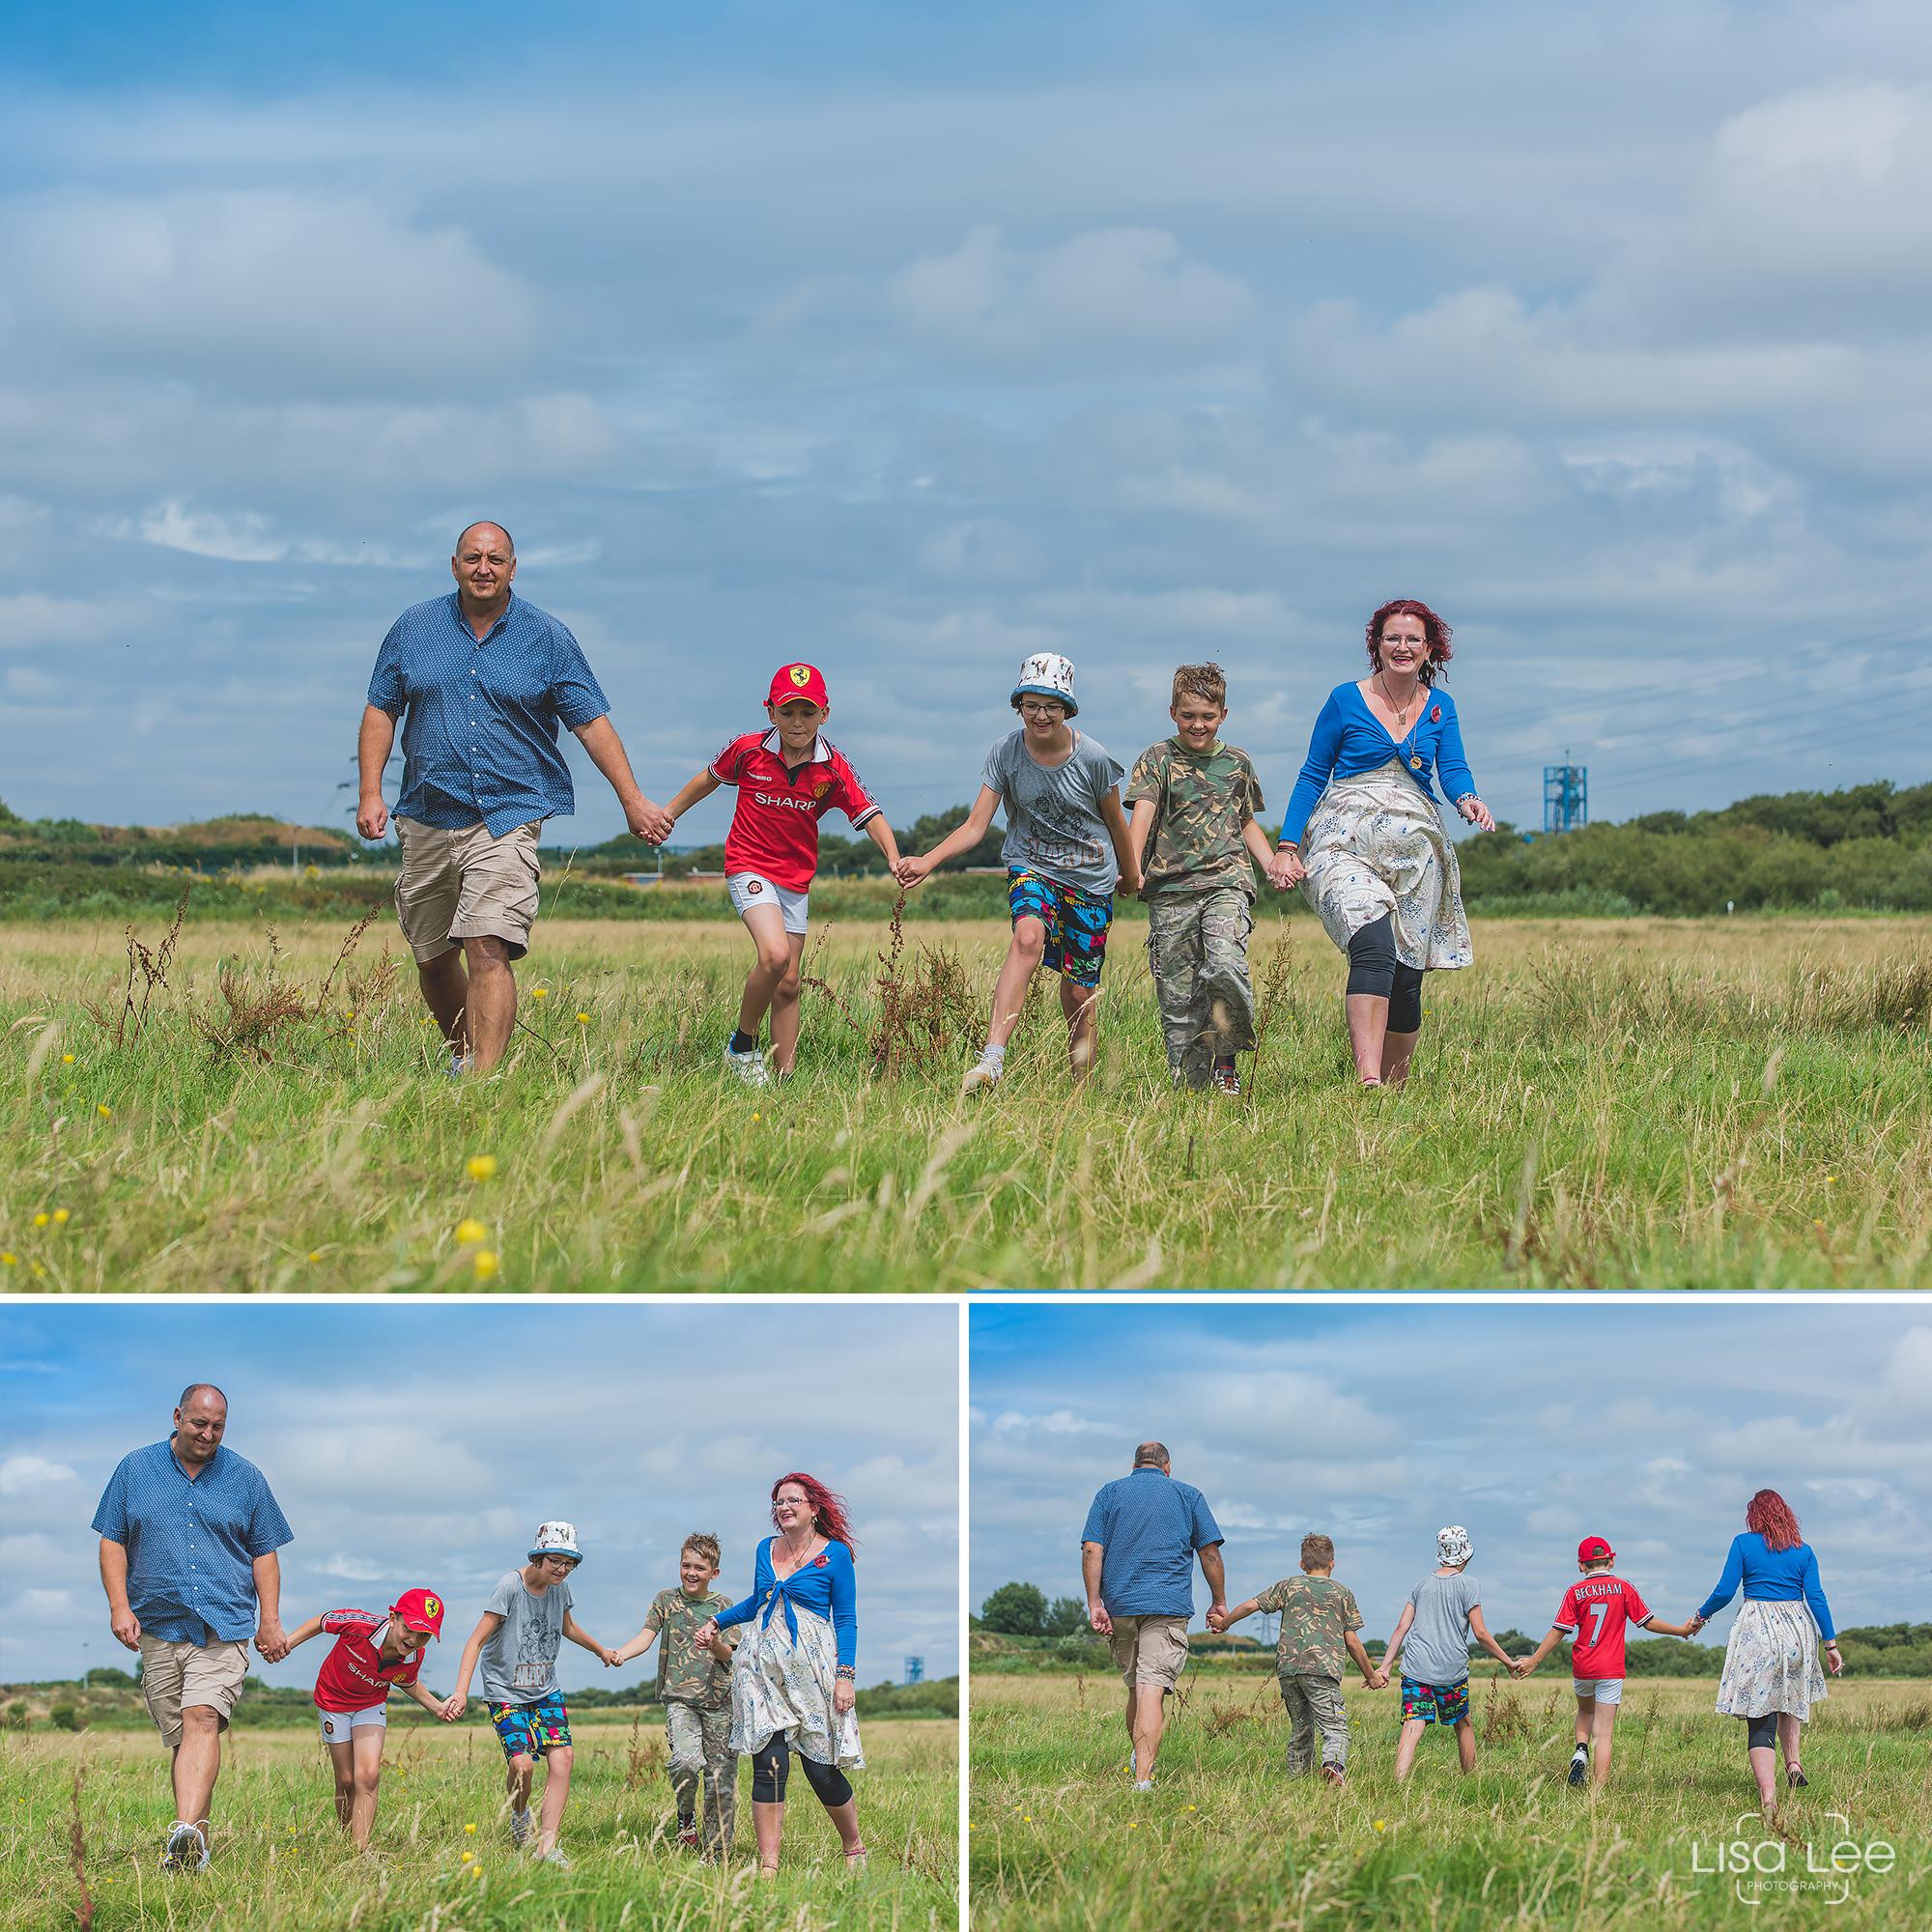 lisa-lee-photography-pateman-family-shoot-countryside-walk.jpg